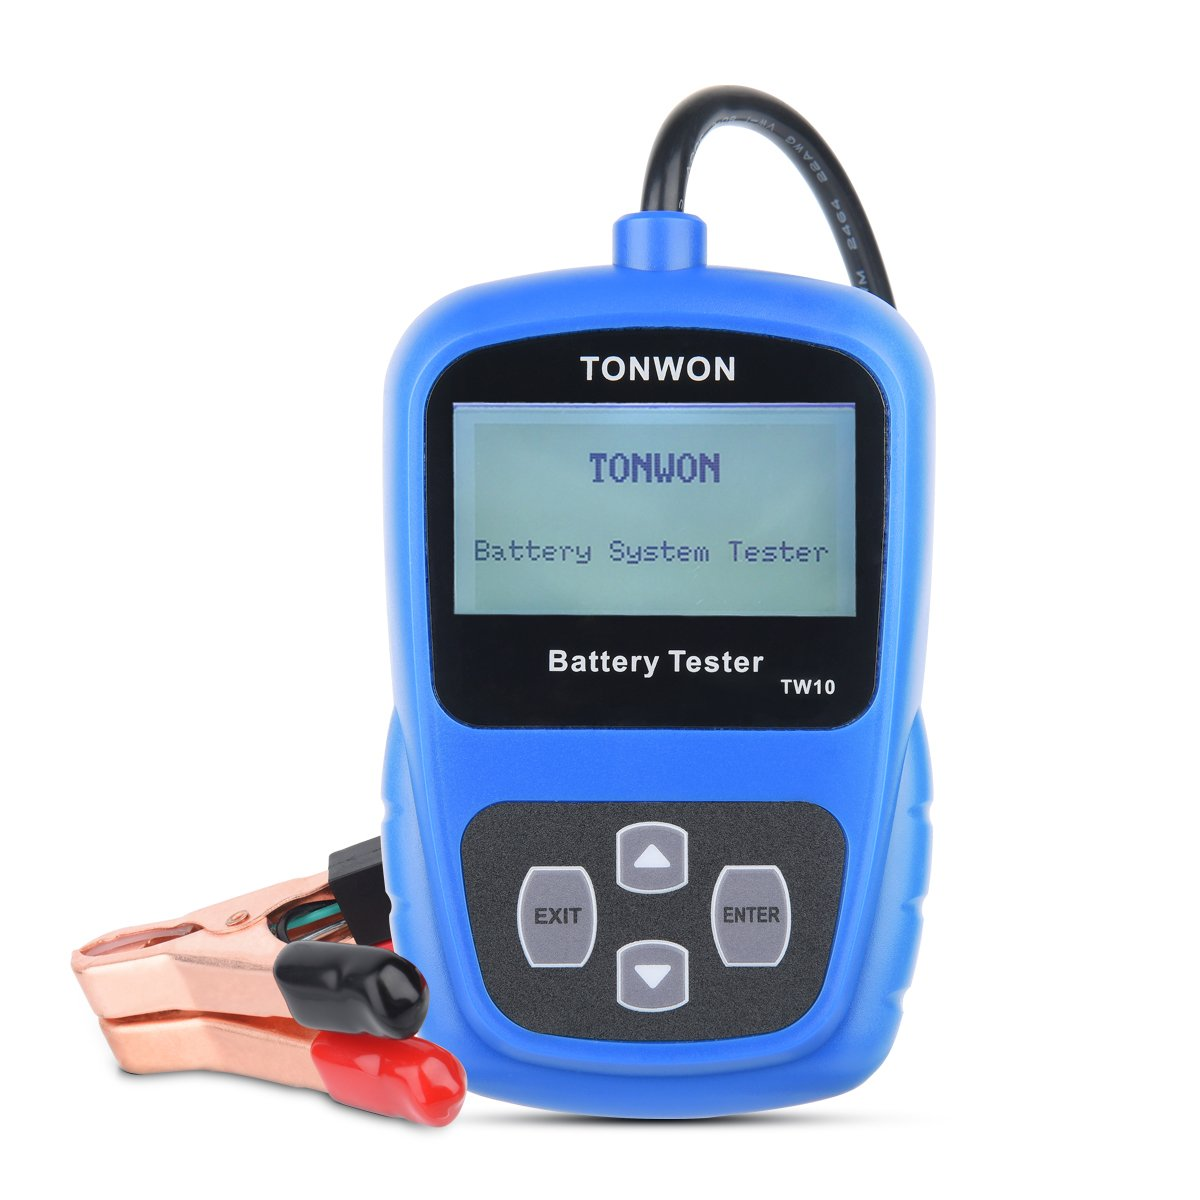 TONWON Probador De La Baterí a de 12V Bluetooth Wireless Automotive Baterí a de carga probador de carga del Sistema de Diagnó stico del Analizador del Monitor para Android y iOS de Dispositivos TonwonEU 01